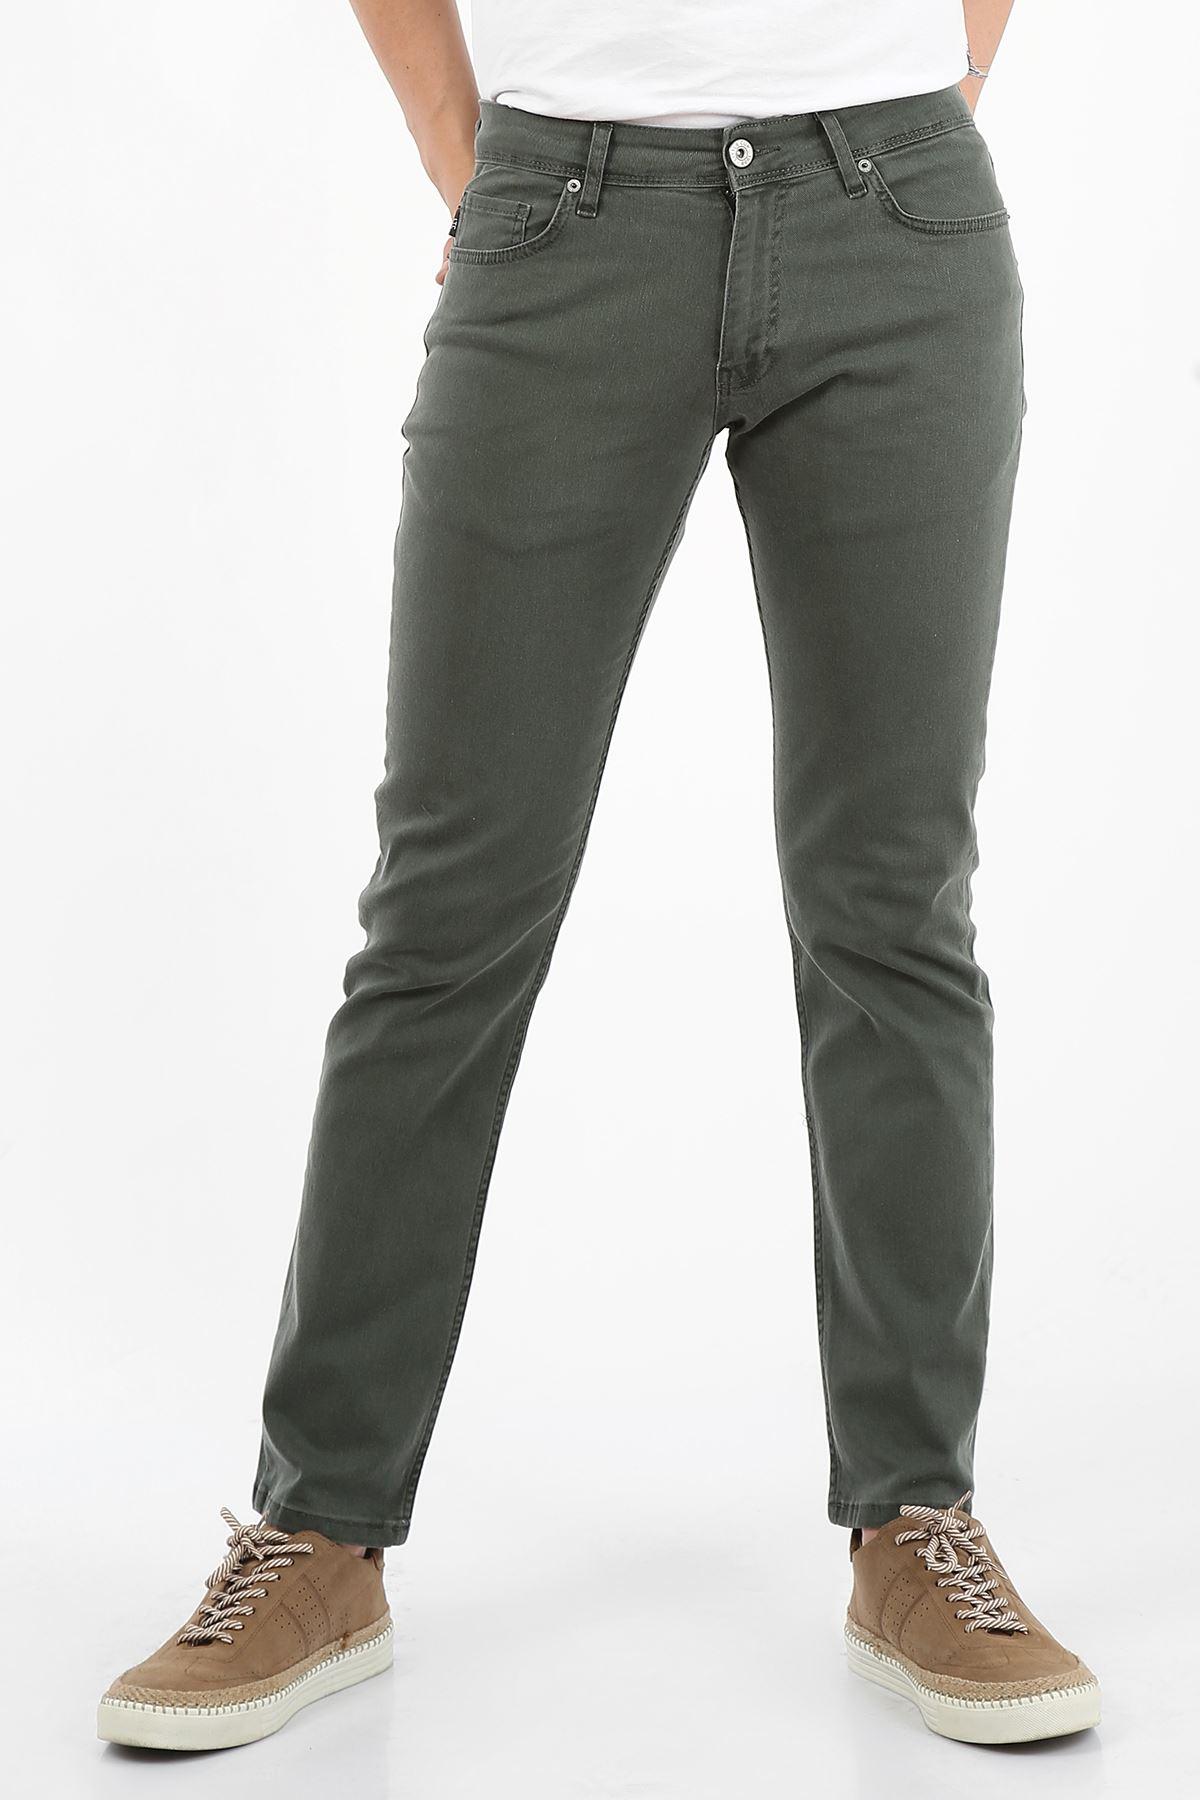 Haki Regular Fit Fermuarlı Erkek Jeans Pantolon-FARADAY